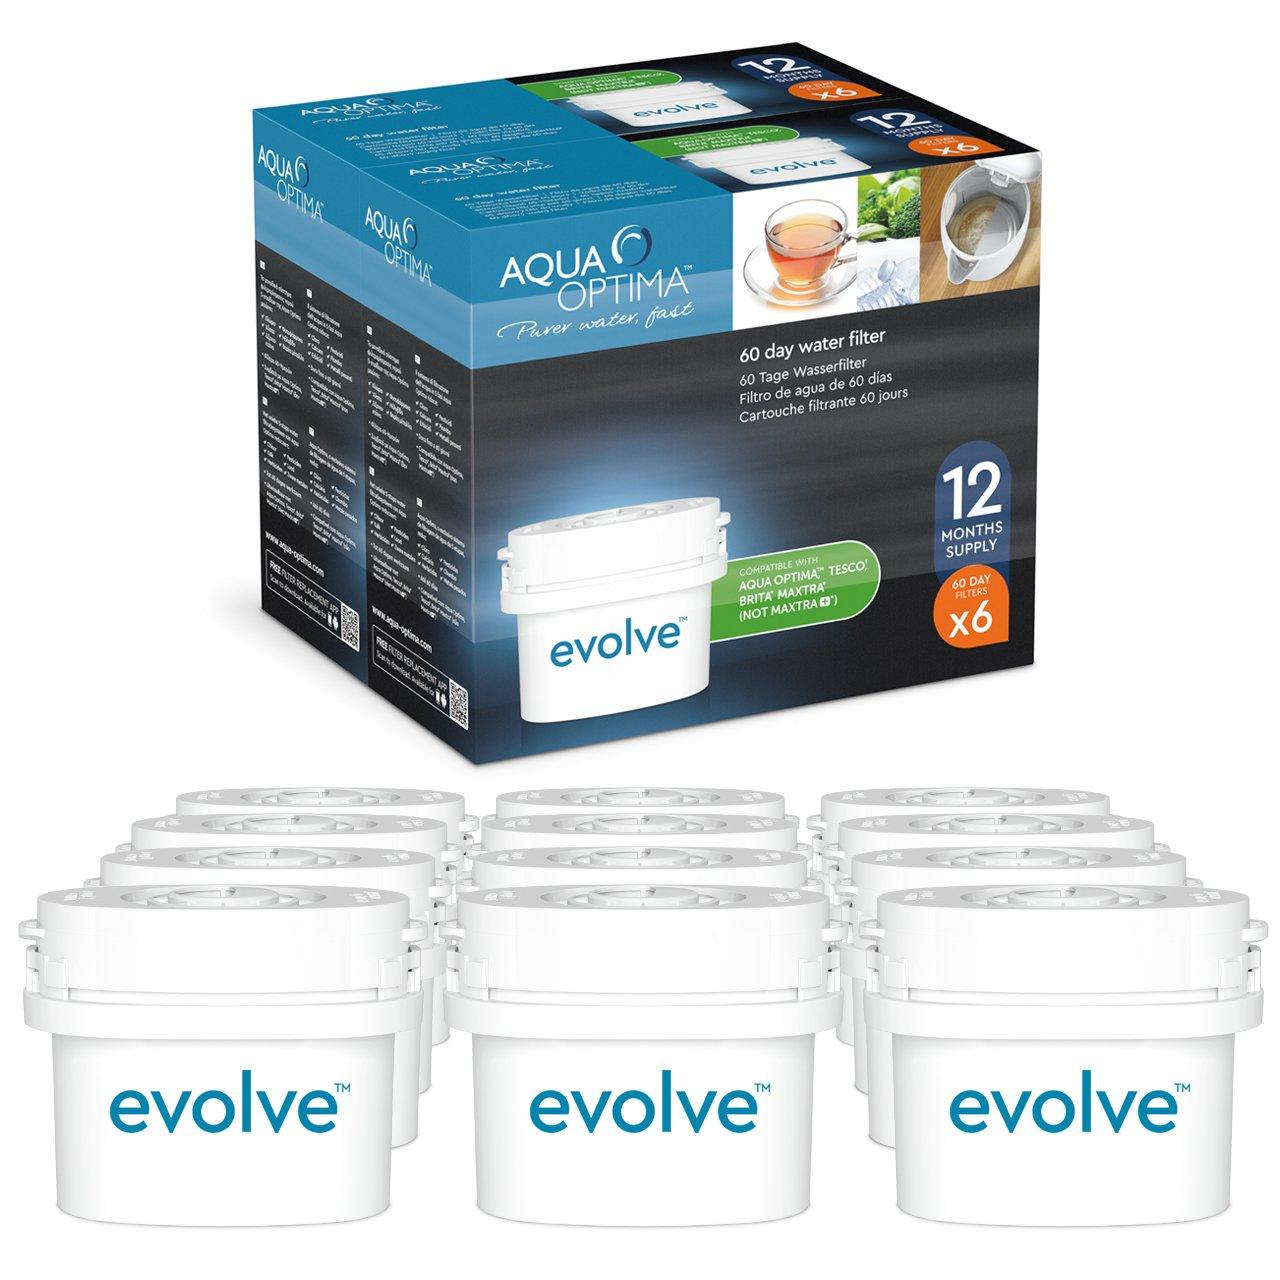 Paquete de años Aqua Optima Evolve filtros de agua de x días